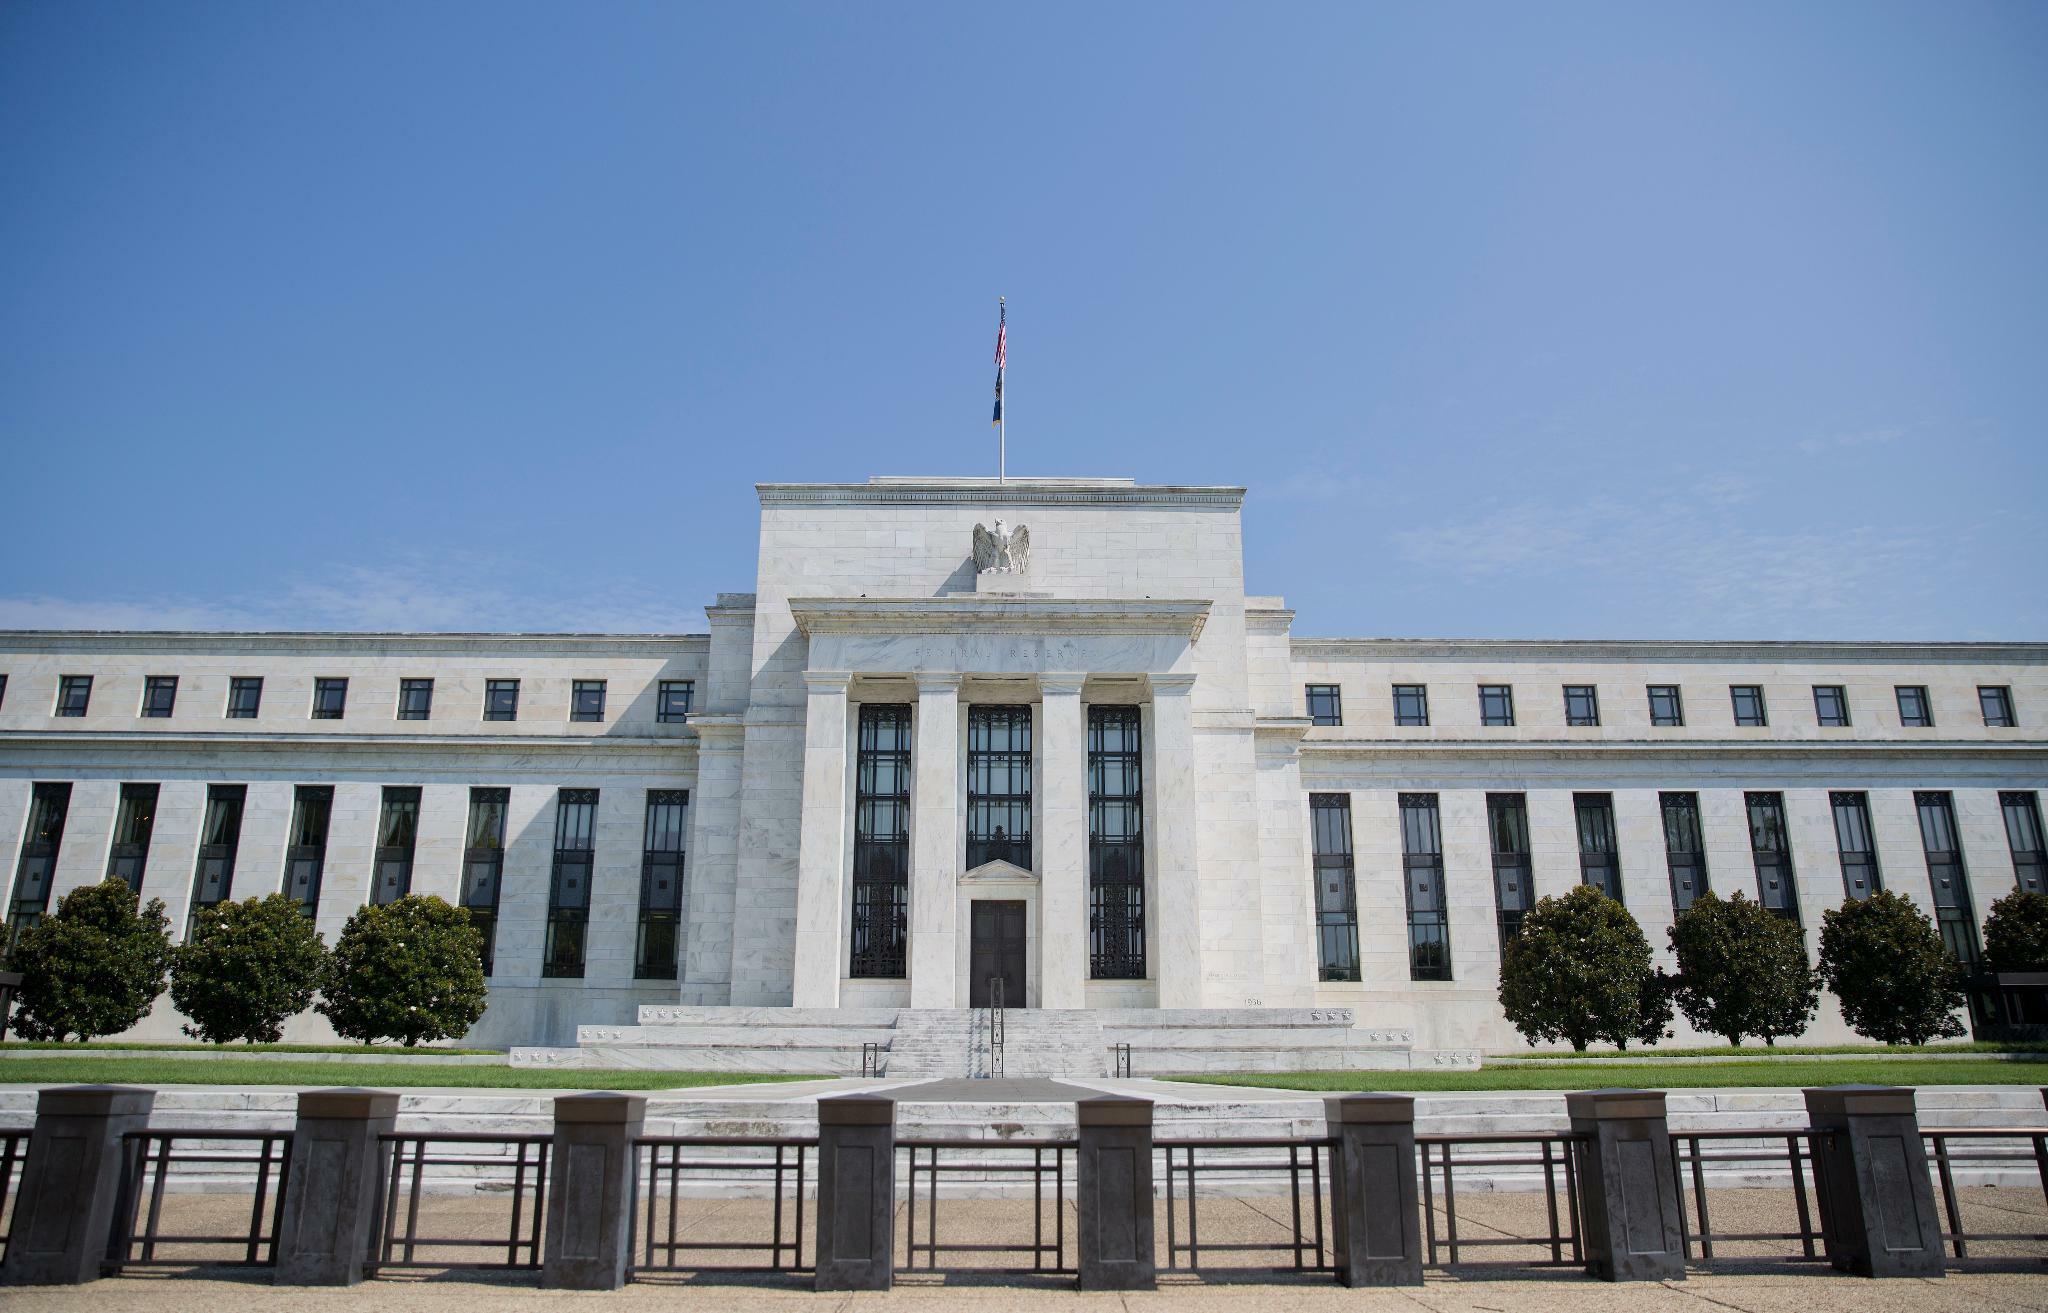 Notenbank: Nach Schrumpfkur rückt Bilanz der US-Notenbank wieder in den Fokus